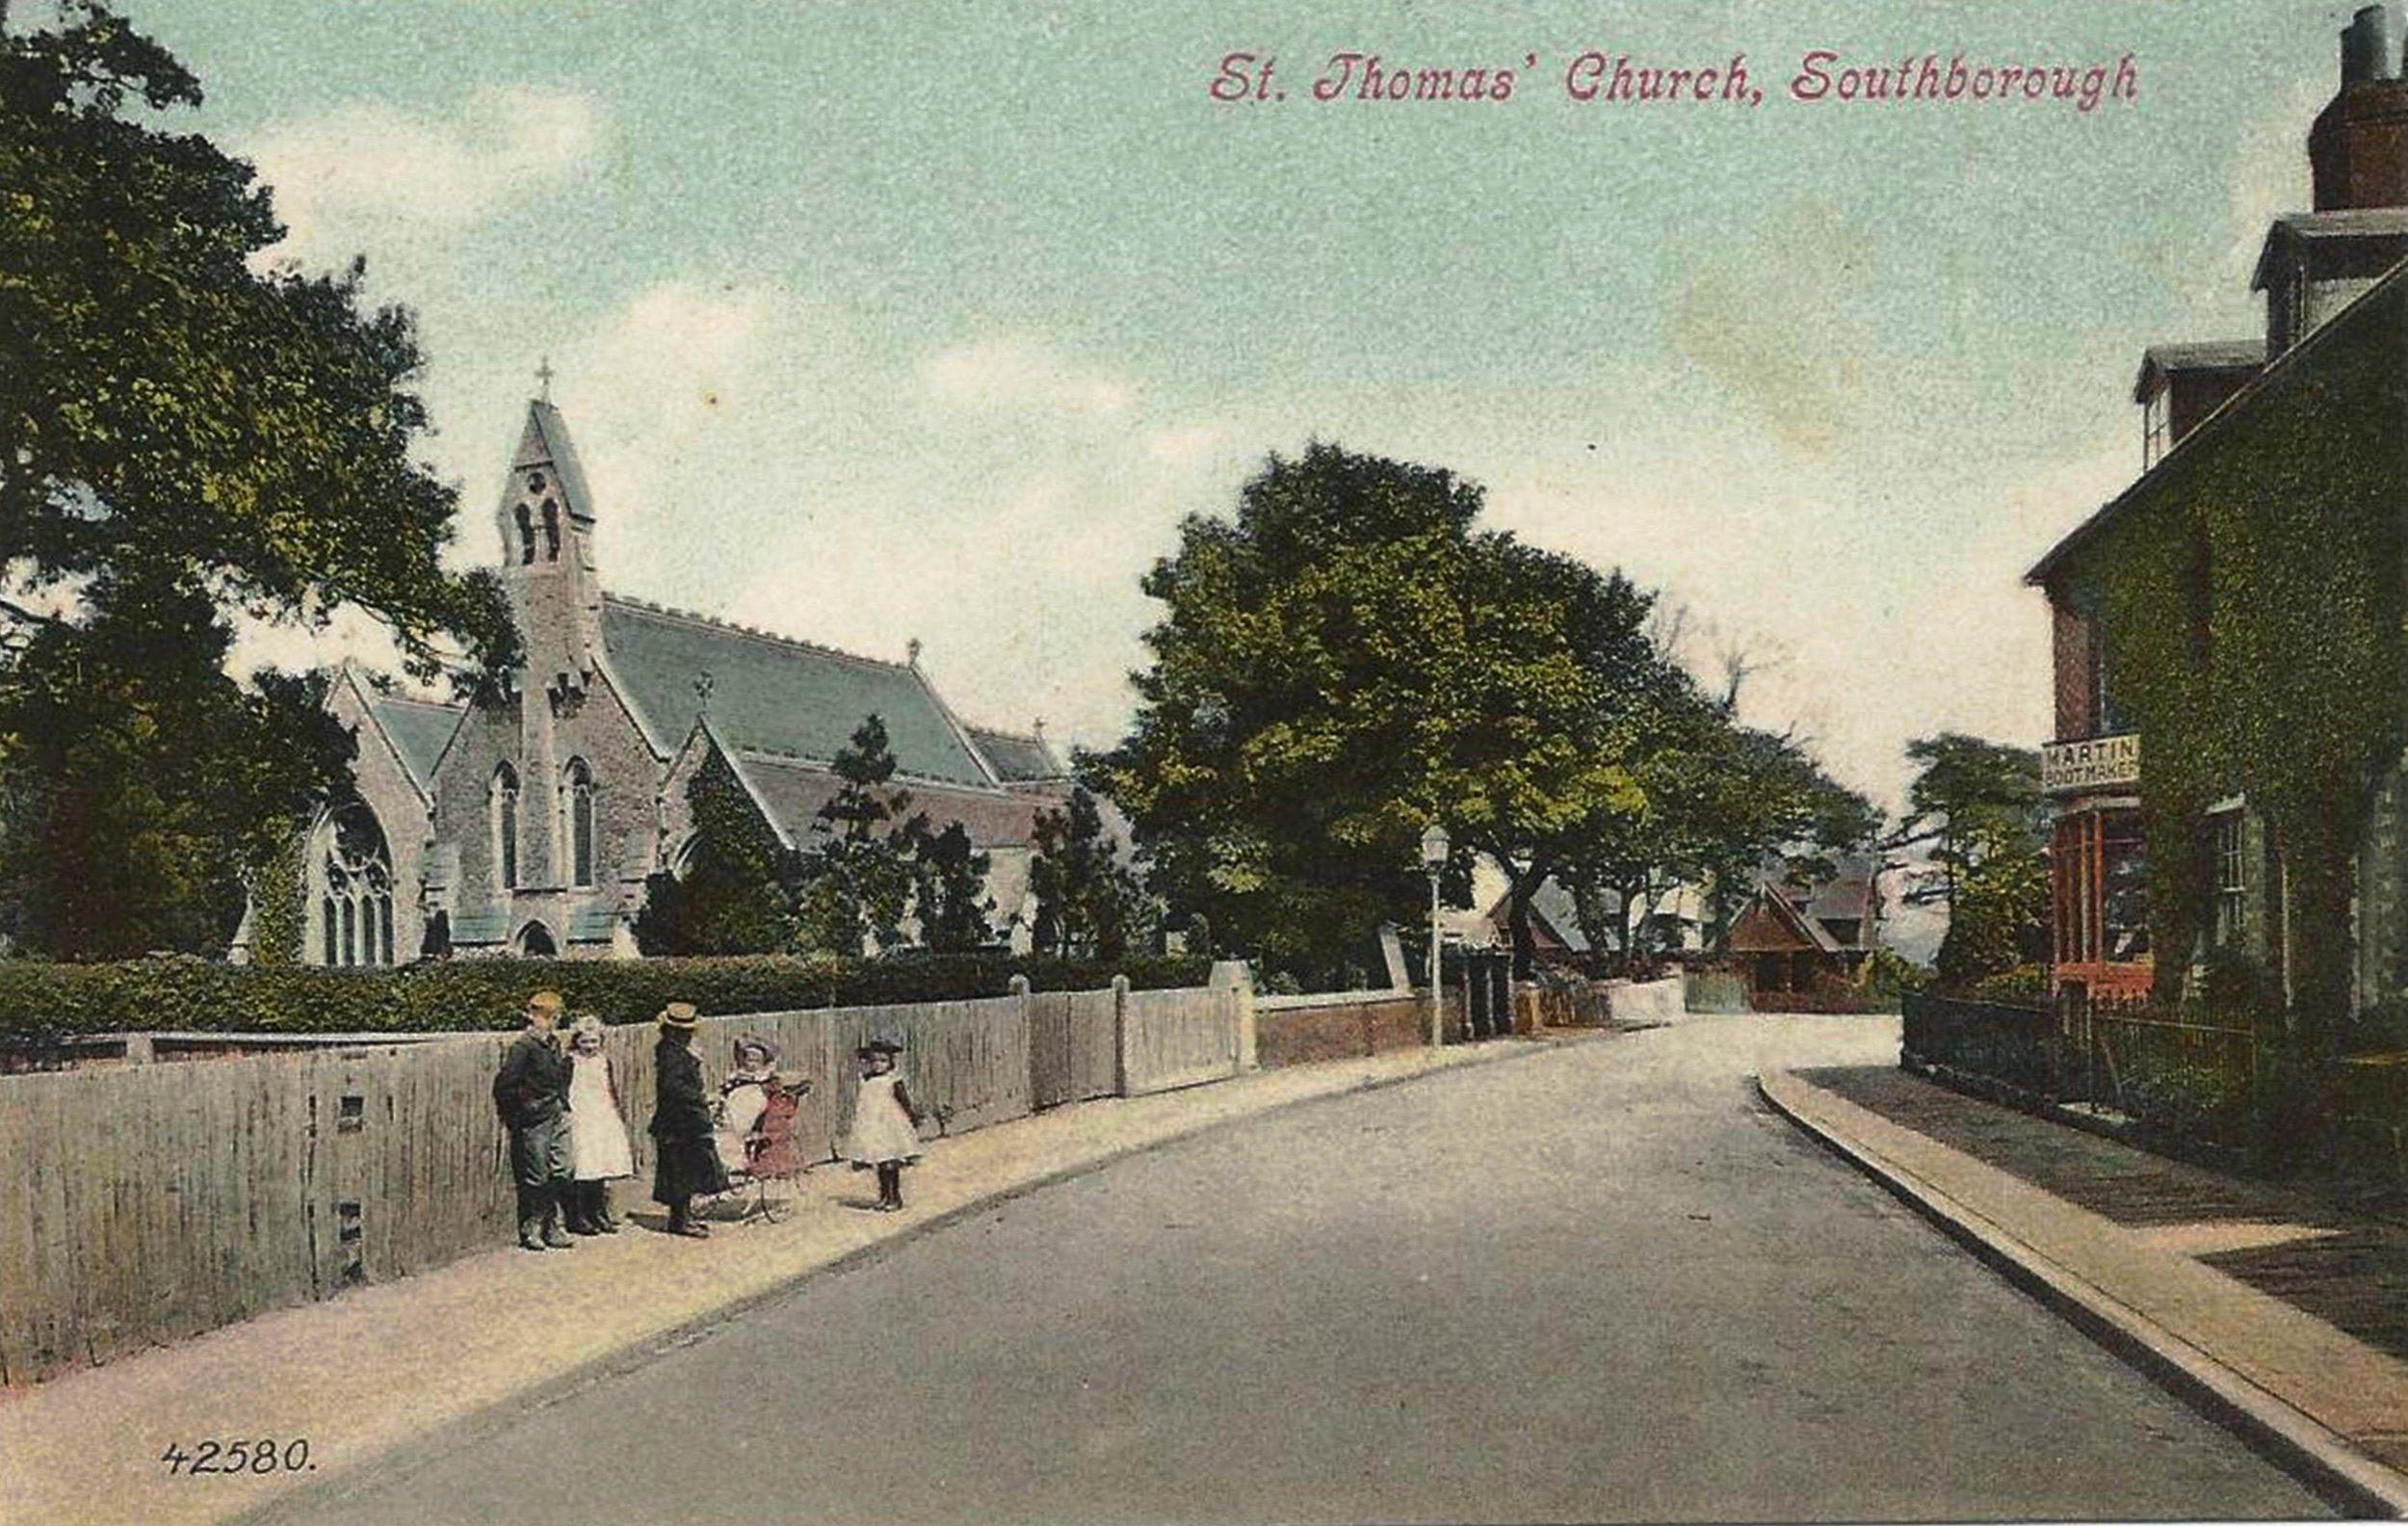 St Thomas's Church (No. 30)